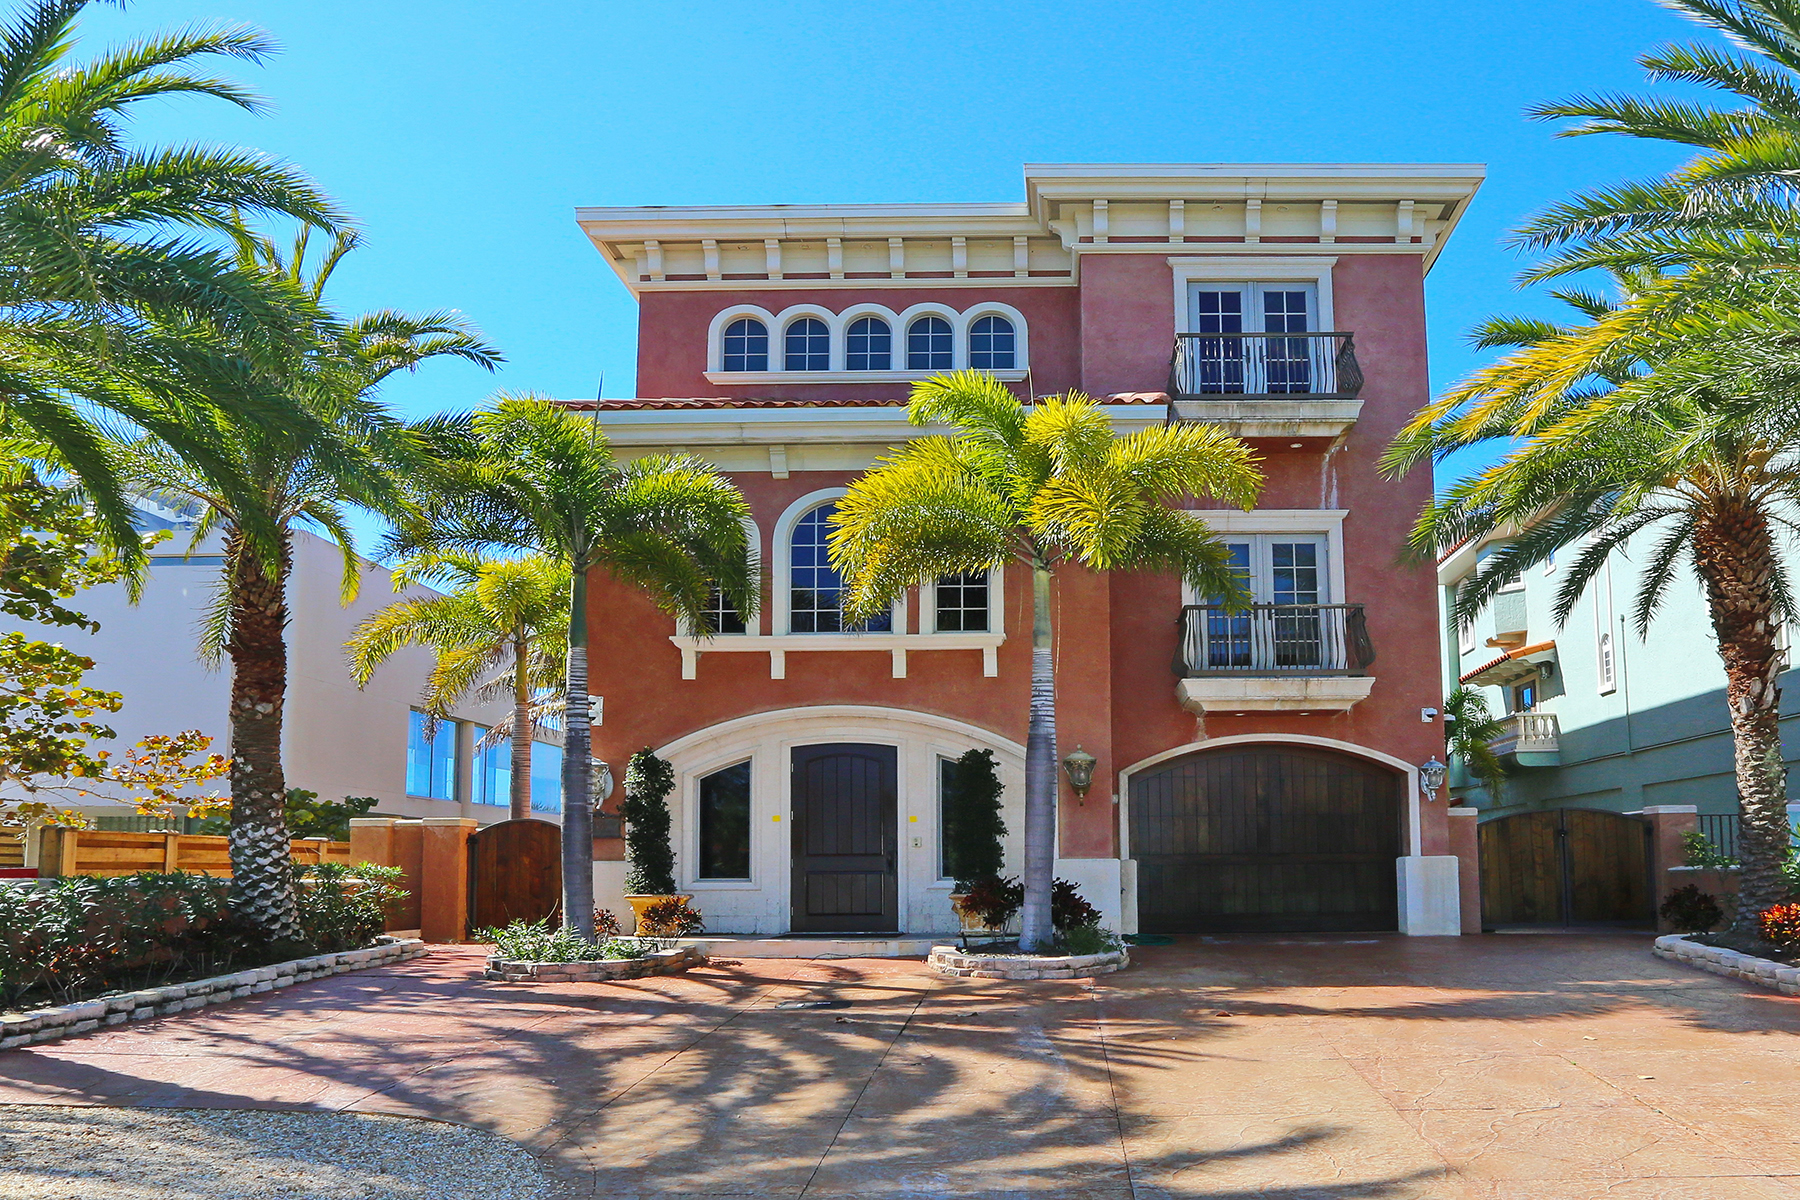 Single Family Home for Sale at ANNA MARIA 801 N Shore Dr Anna Maria, Florida 34216 United States